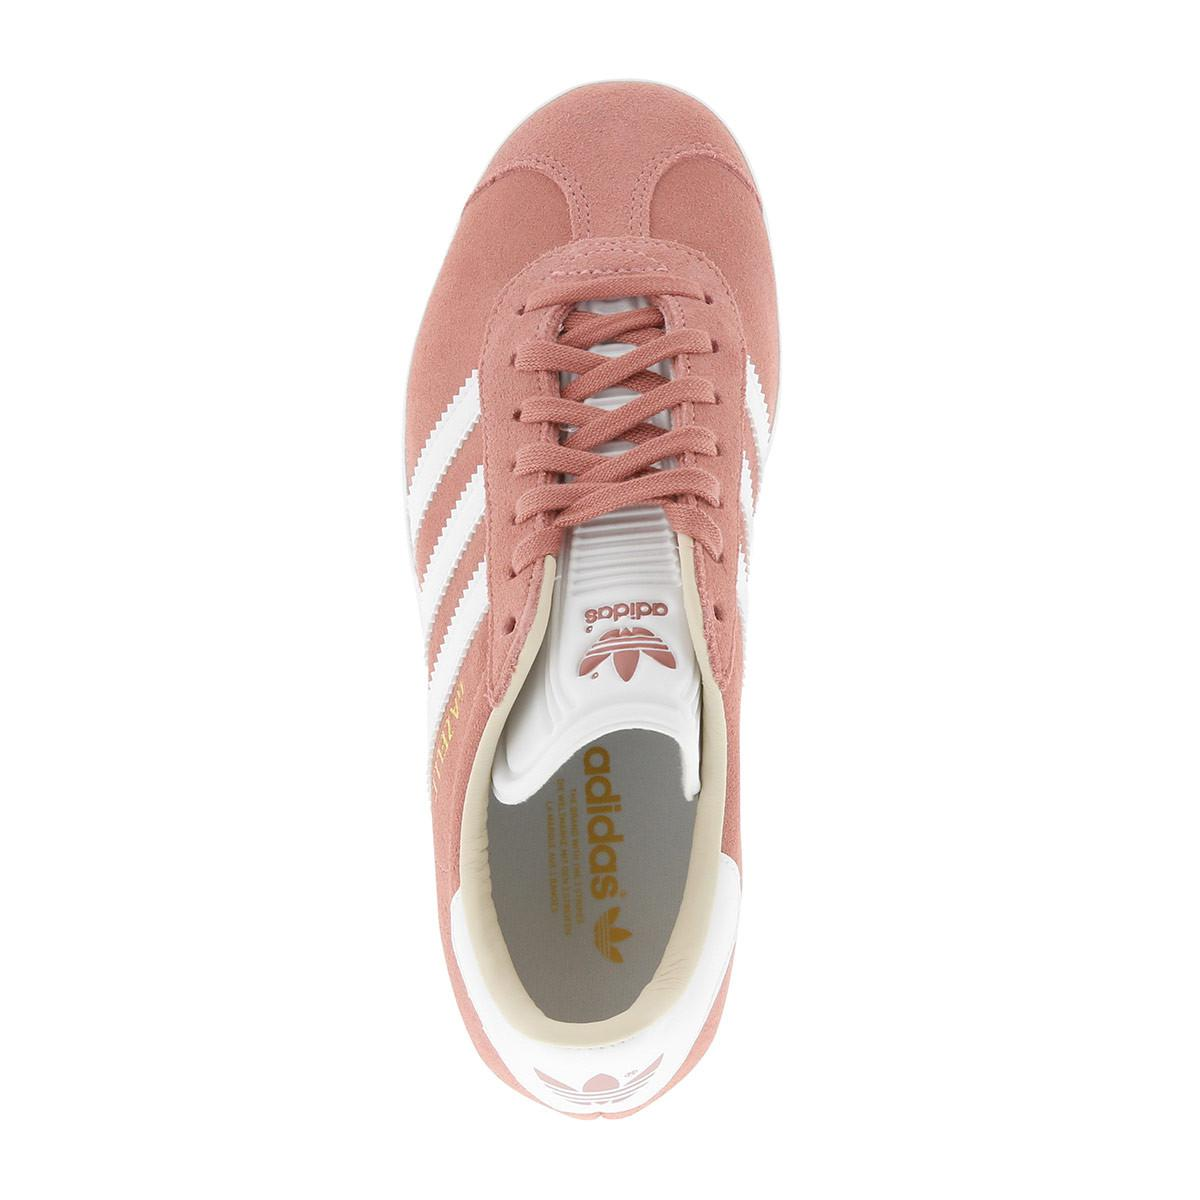 adidas Originals Gazelle W Sneaker Ashpeaftwwhtlinen for